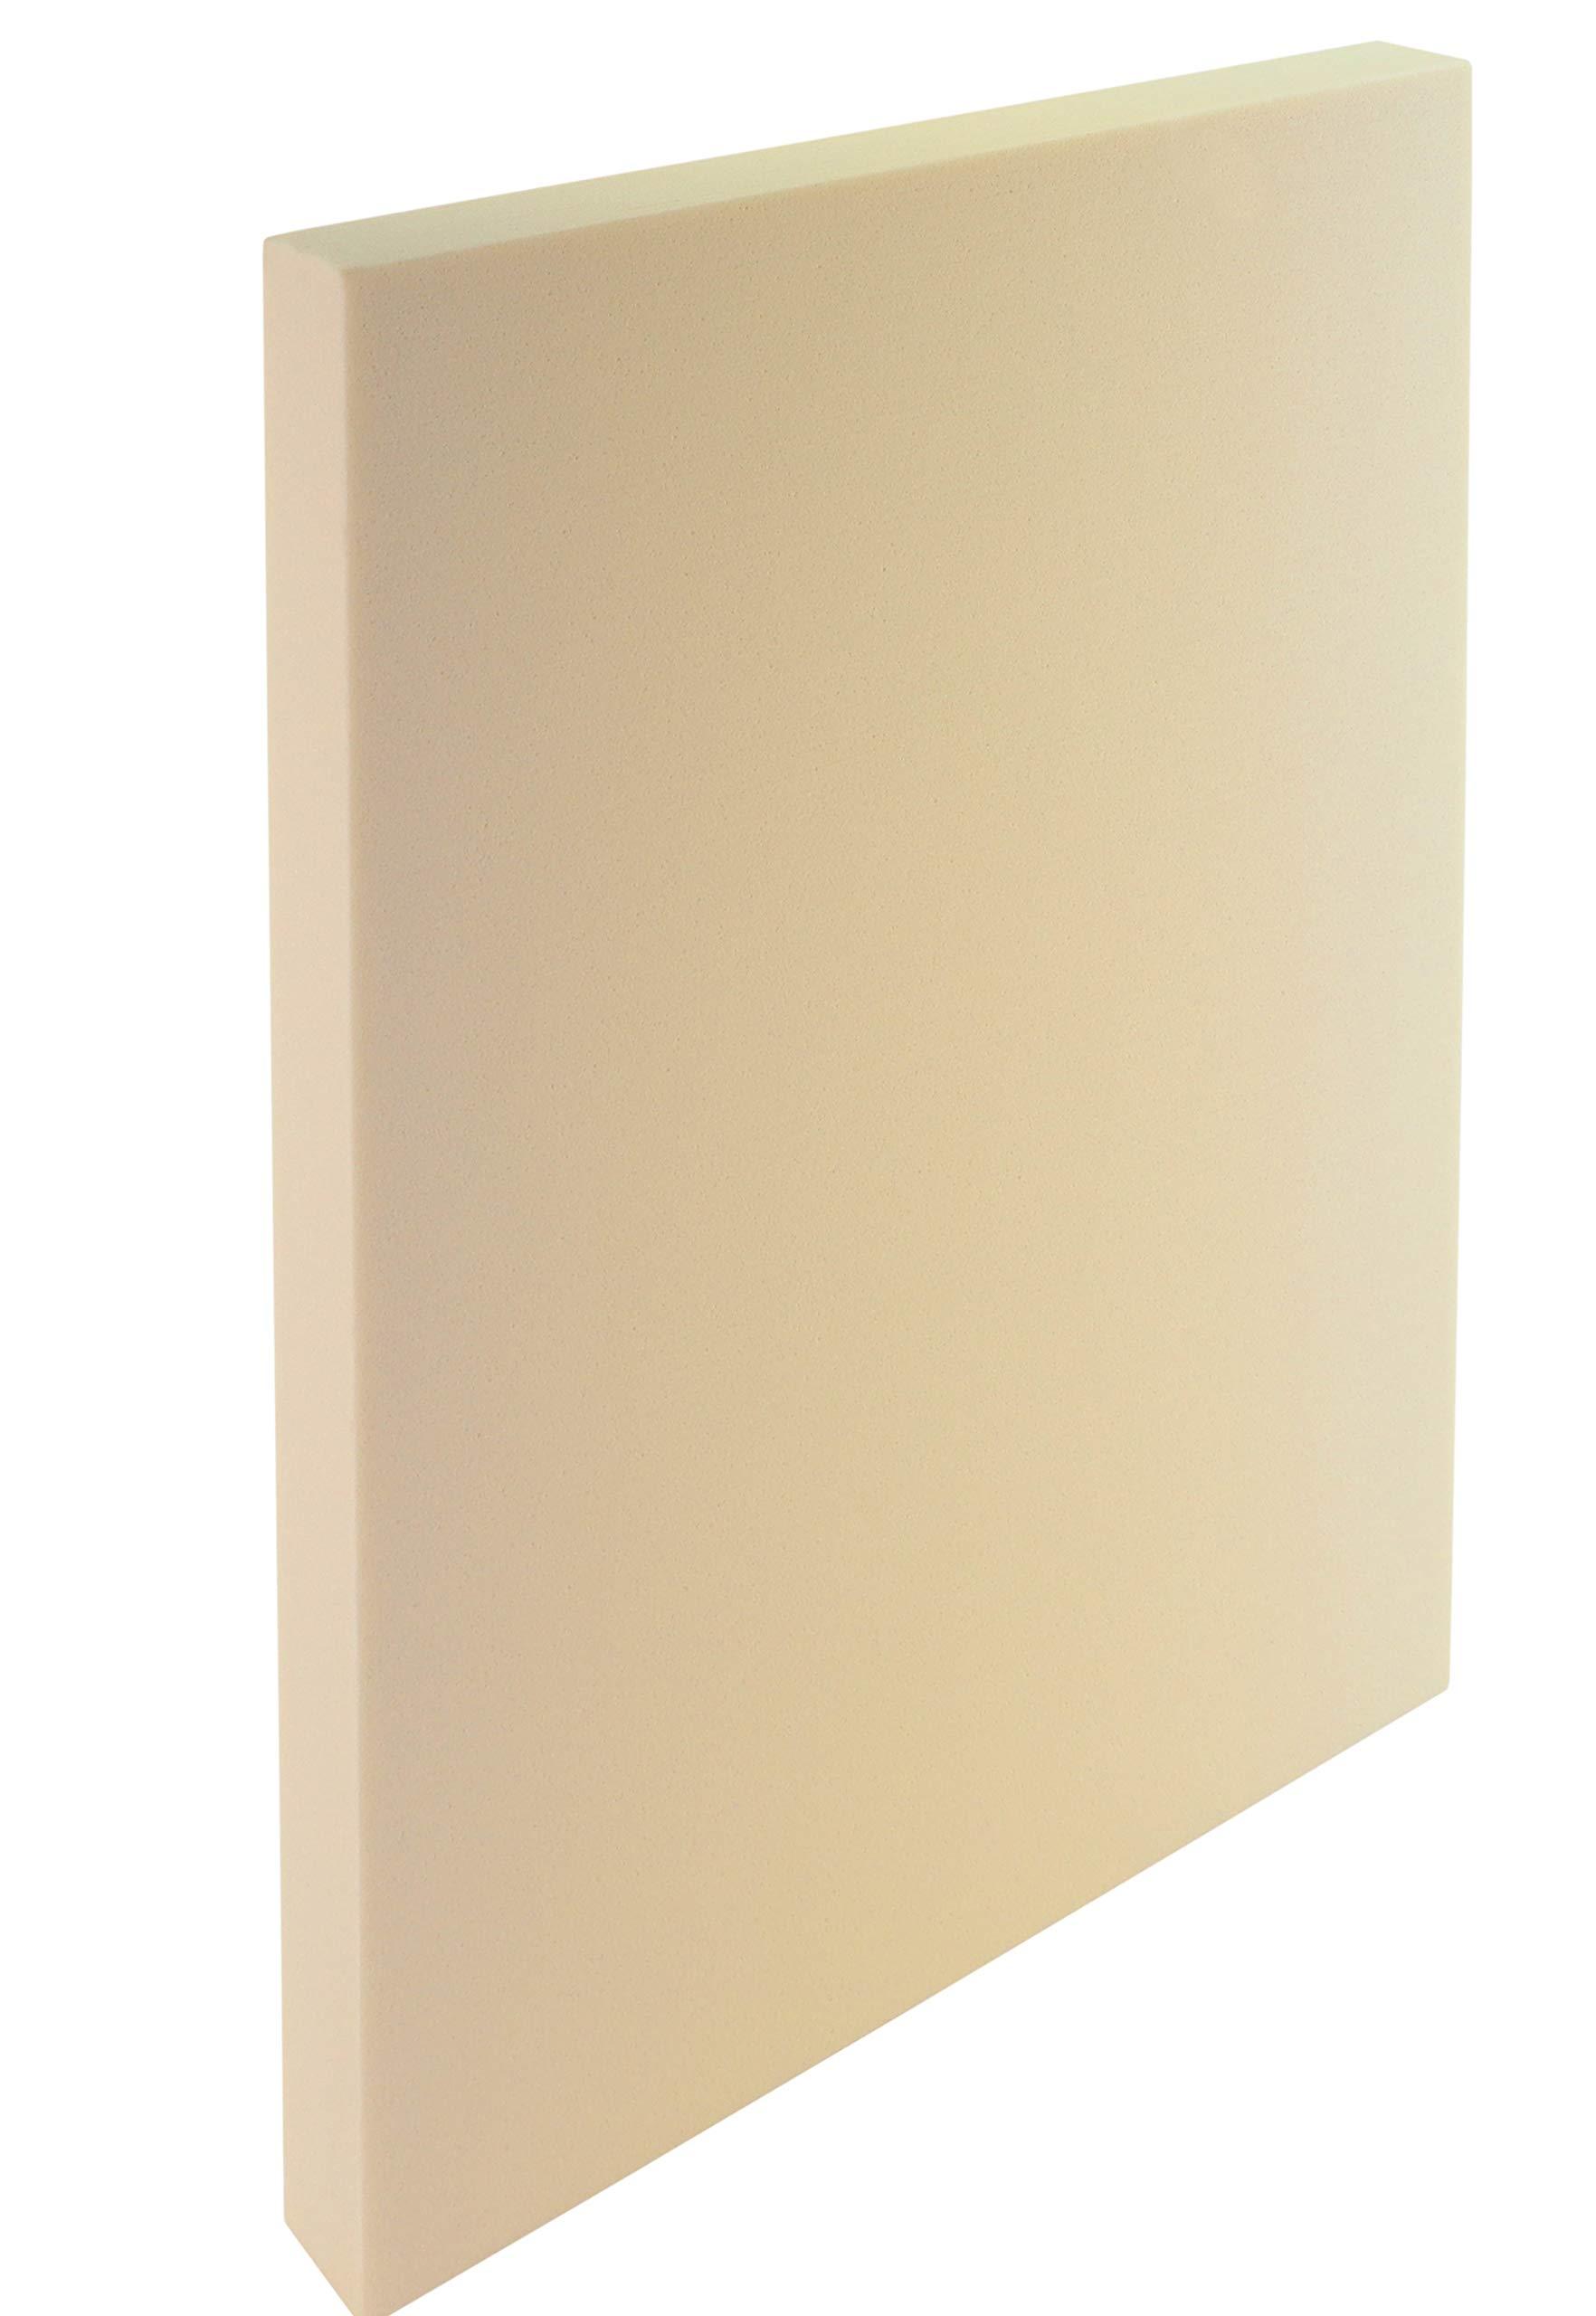 Sculpture Block - Sculpture Canvas - Polyurethane Foam Board - 16 x 12 x 1 inches